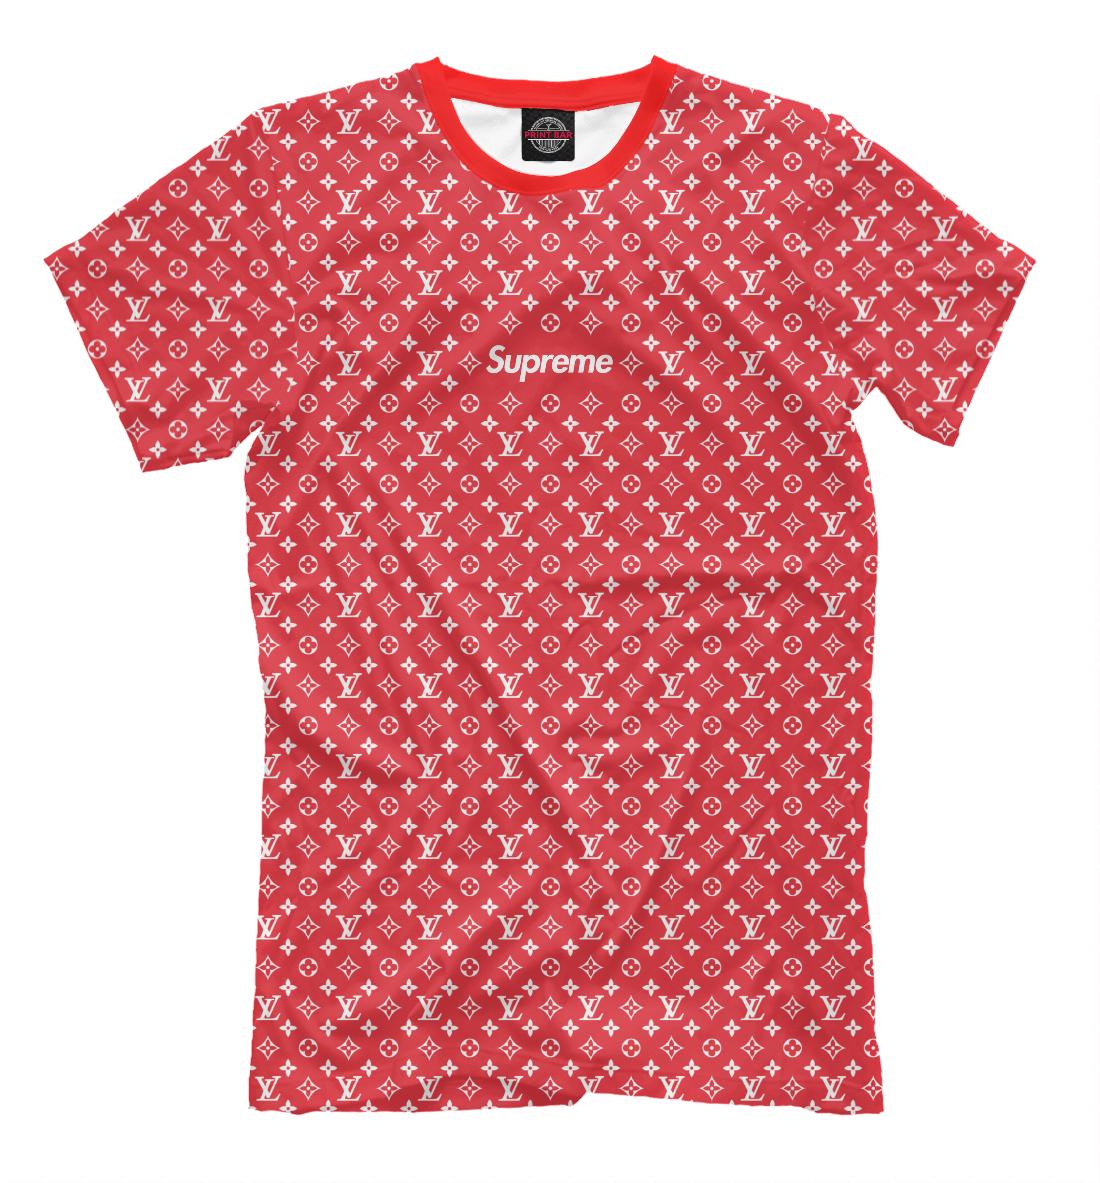 Купить SUPREME Louis Vuitton, Printbar, Футболки, SPR-739701-fut-2